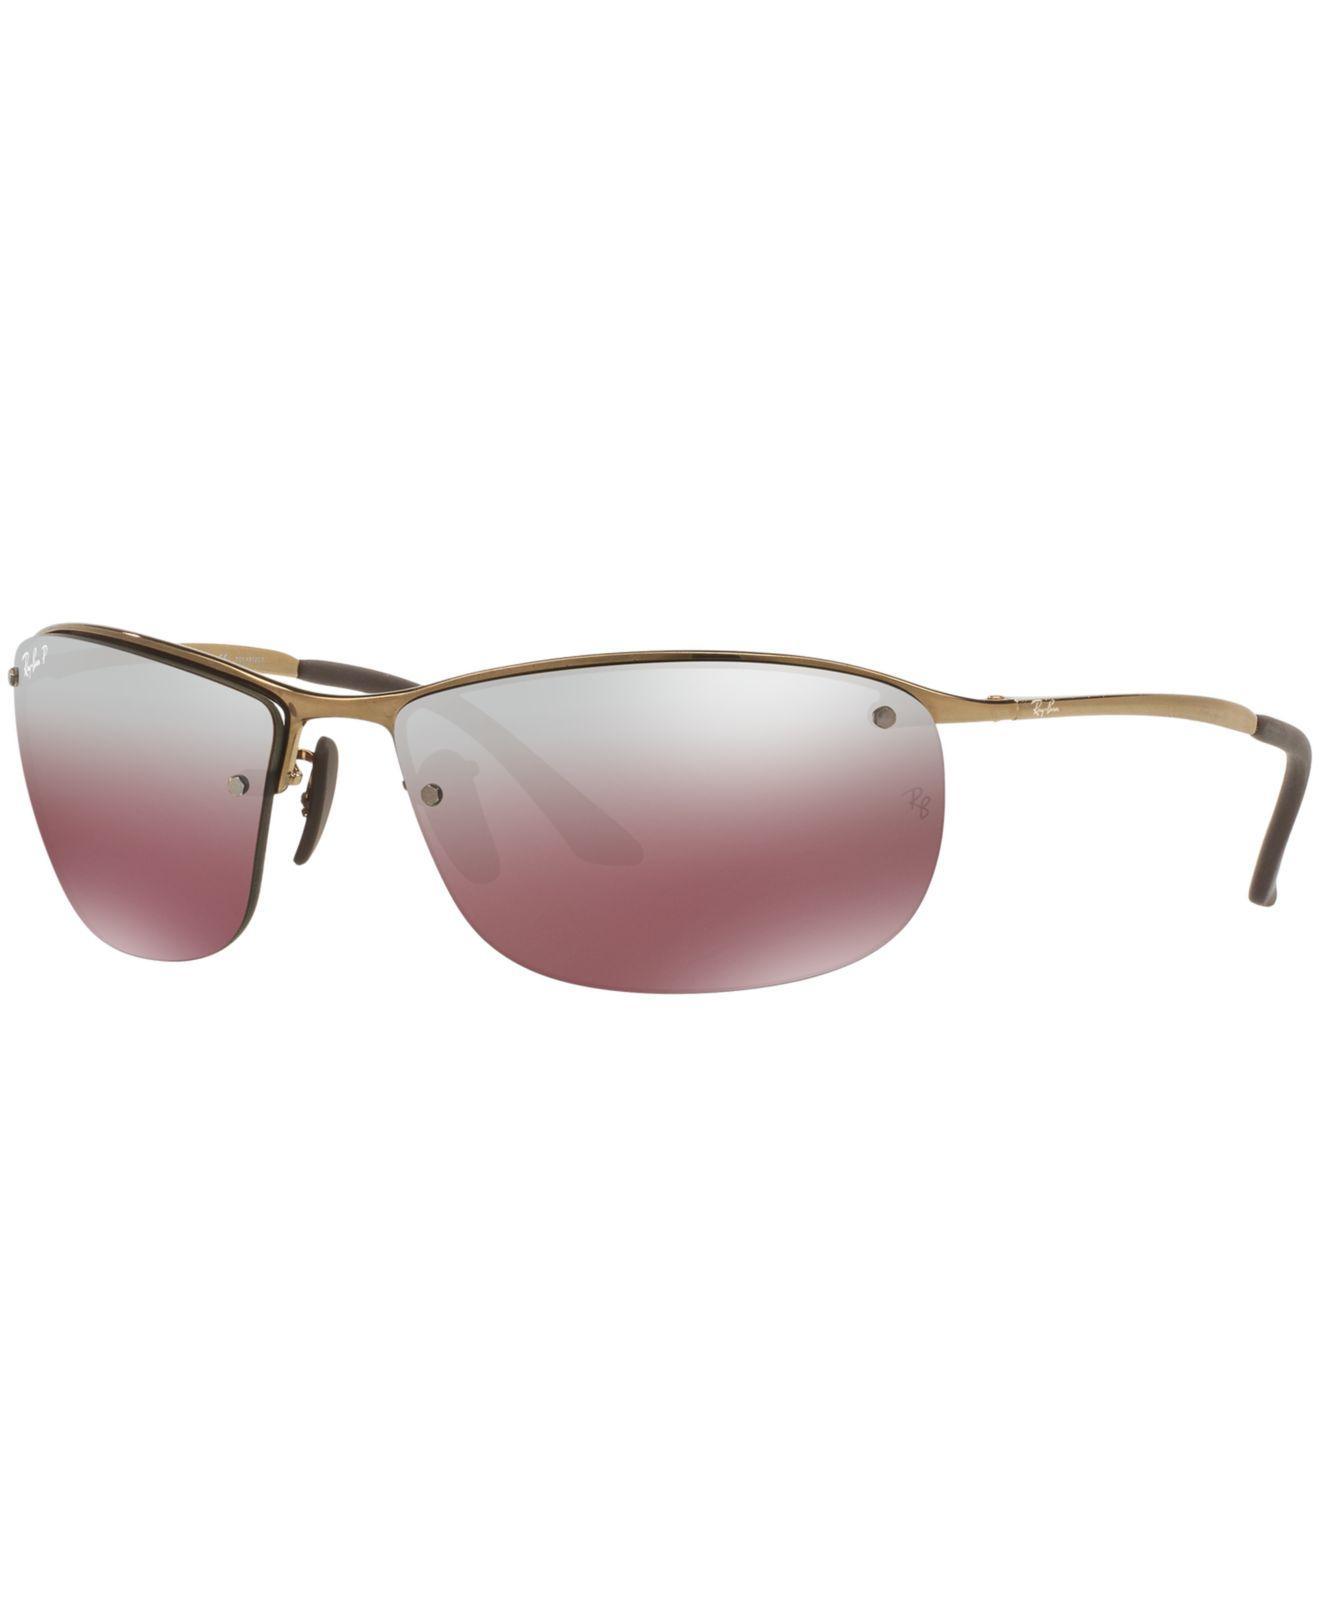 b7adceaa973 Ray-Ban. Women s Brown Sunglasses